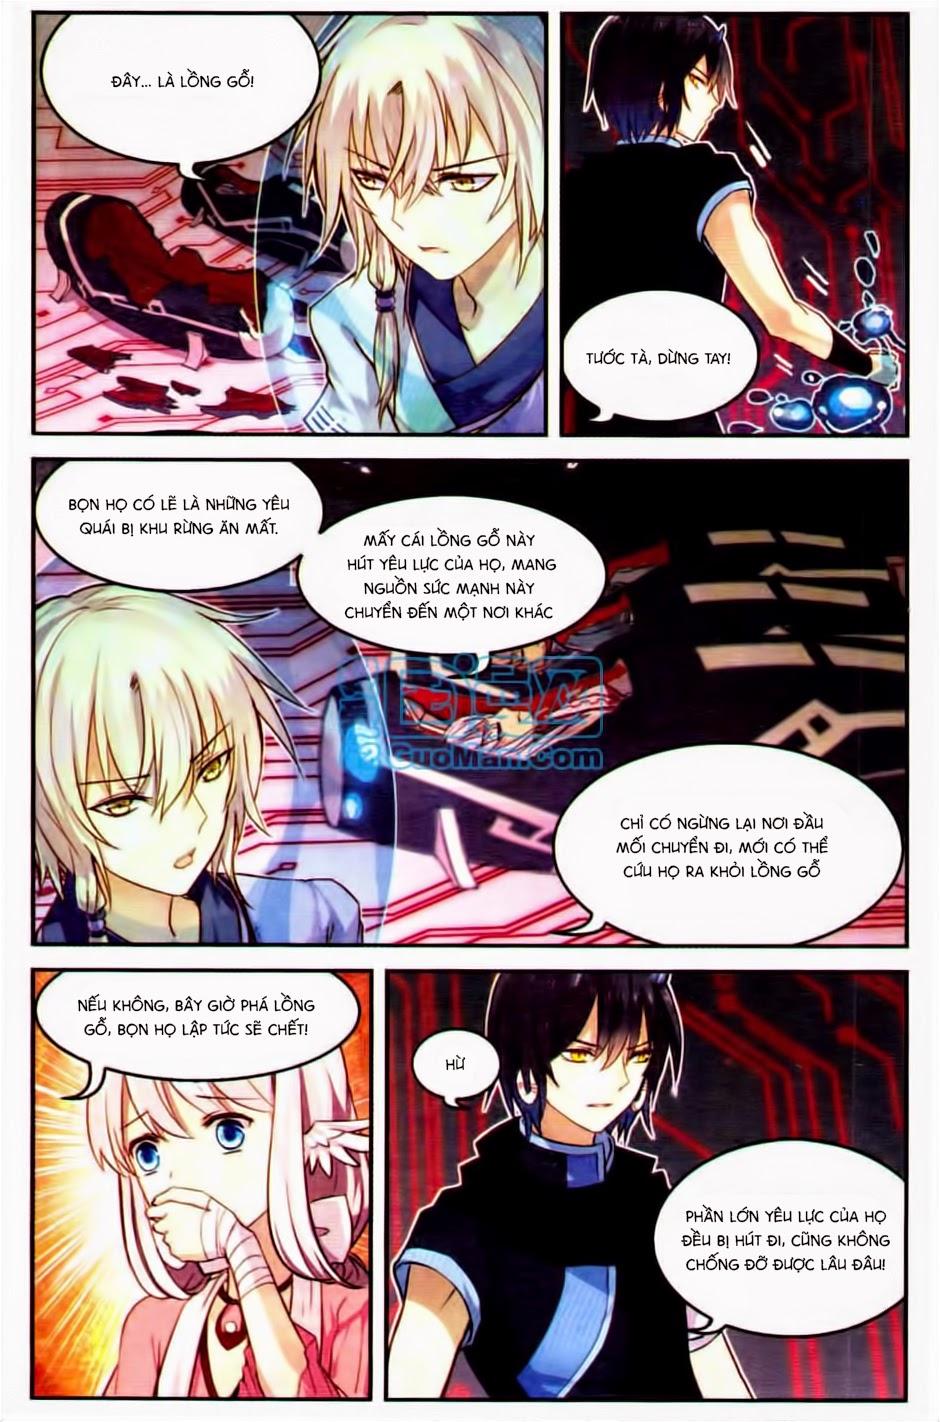 a3manga.com thien hanh thiet su chap 17